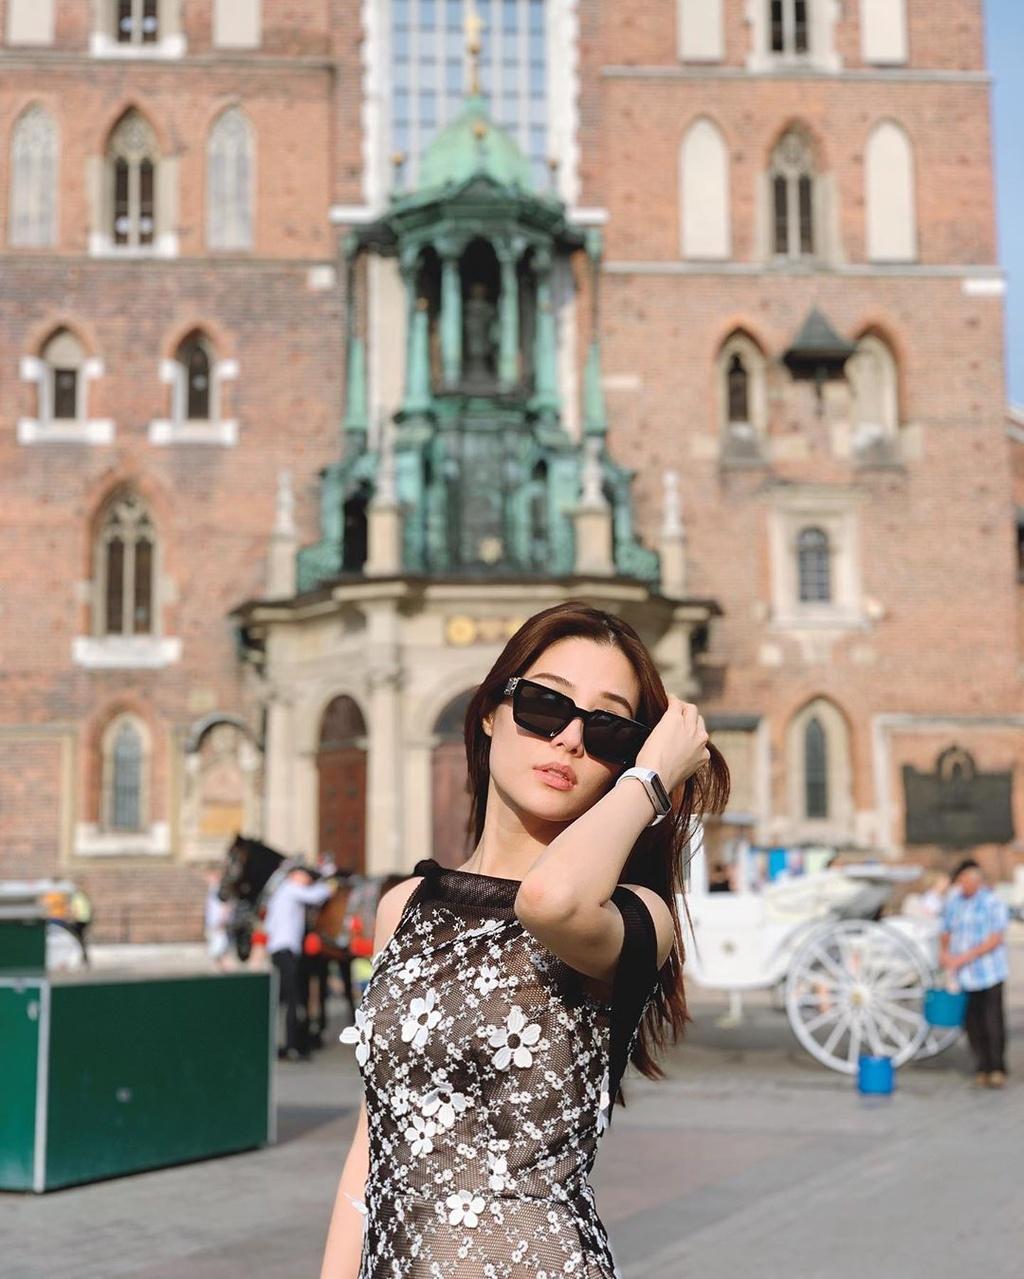 Angela Phuong Trinh va dan sao 'Mua he soi dong' thay doi sau 10 nam hinh anh 8